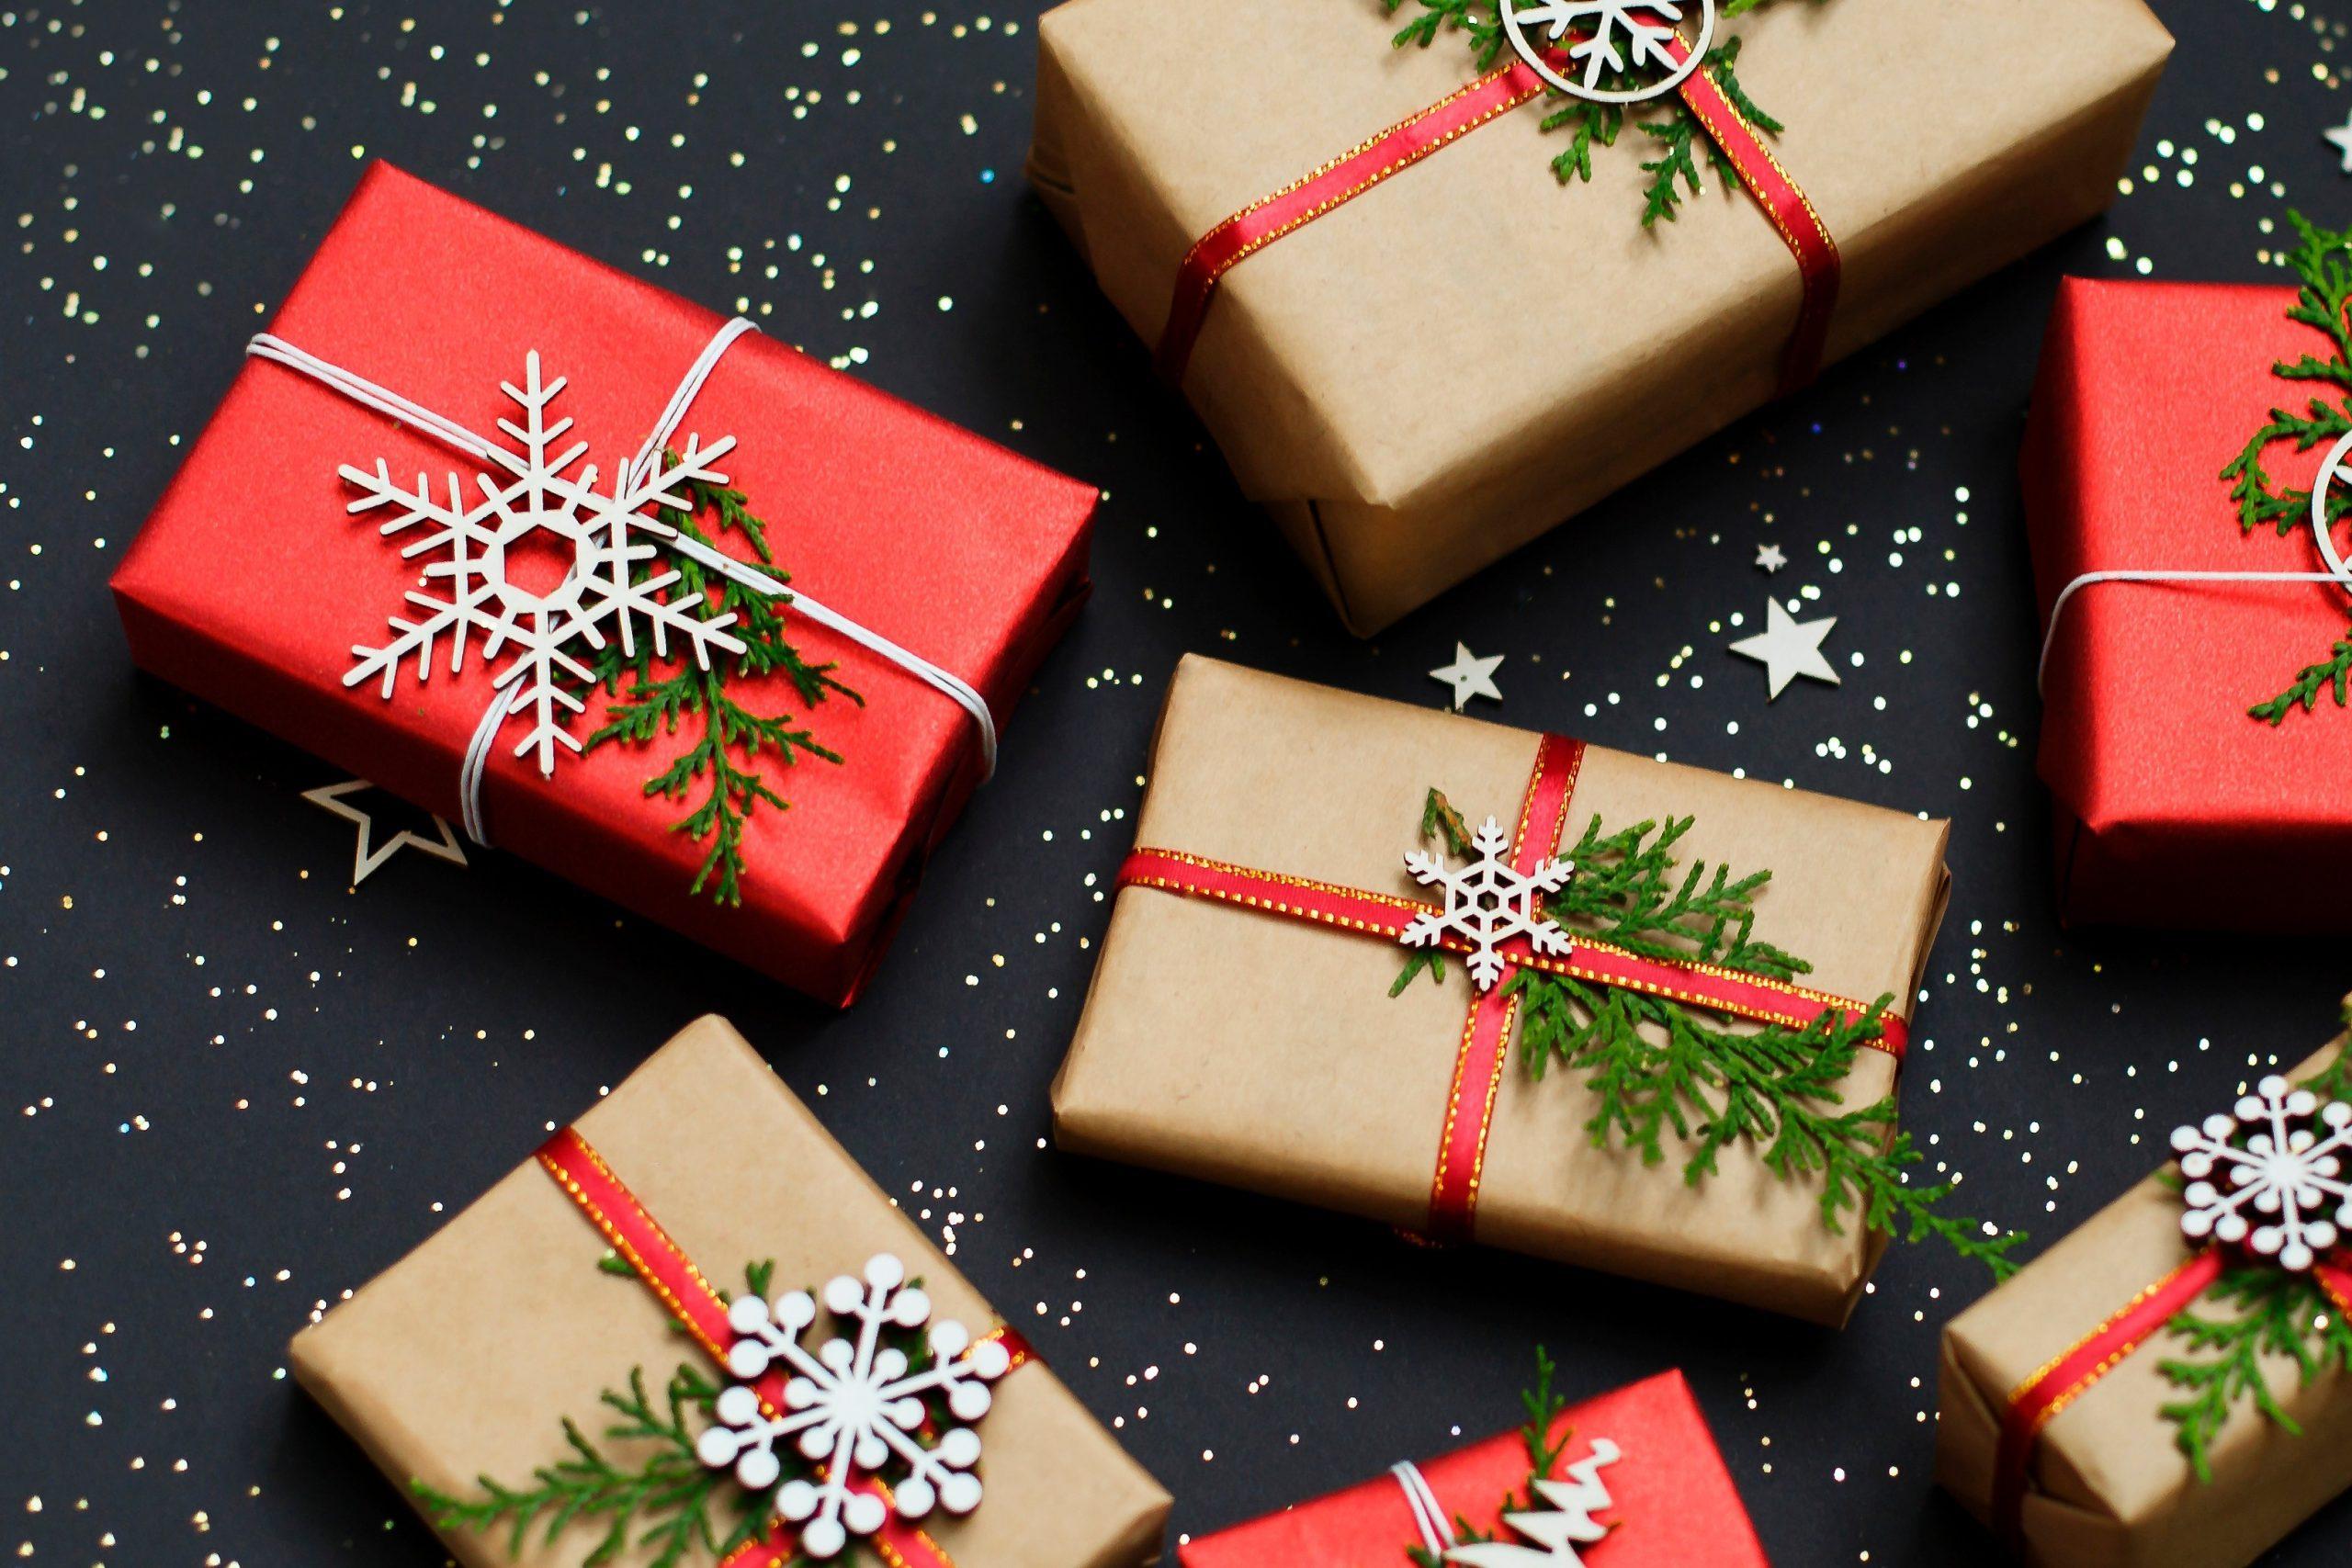 Office Secret Santa Gift Ideas Funny from www.rd.com